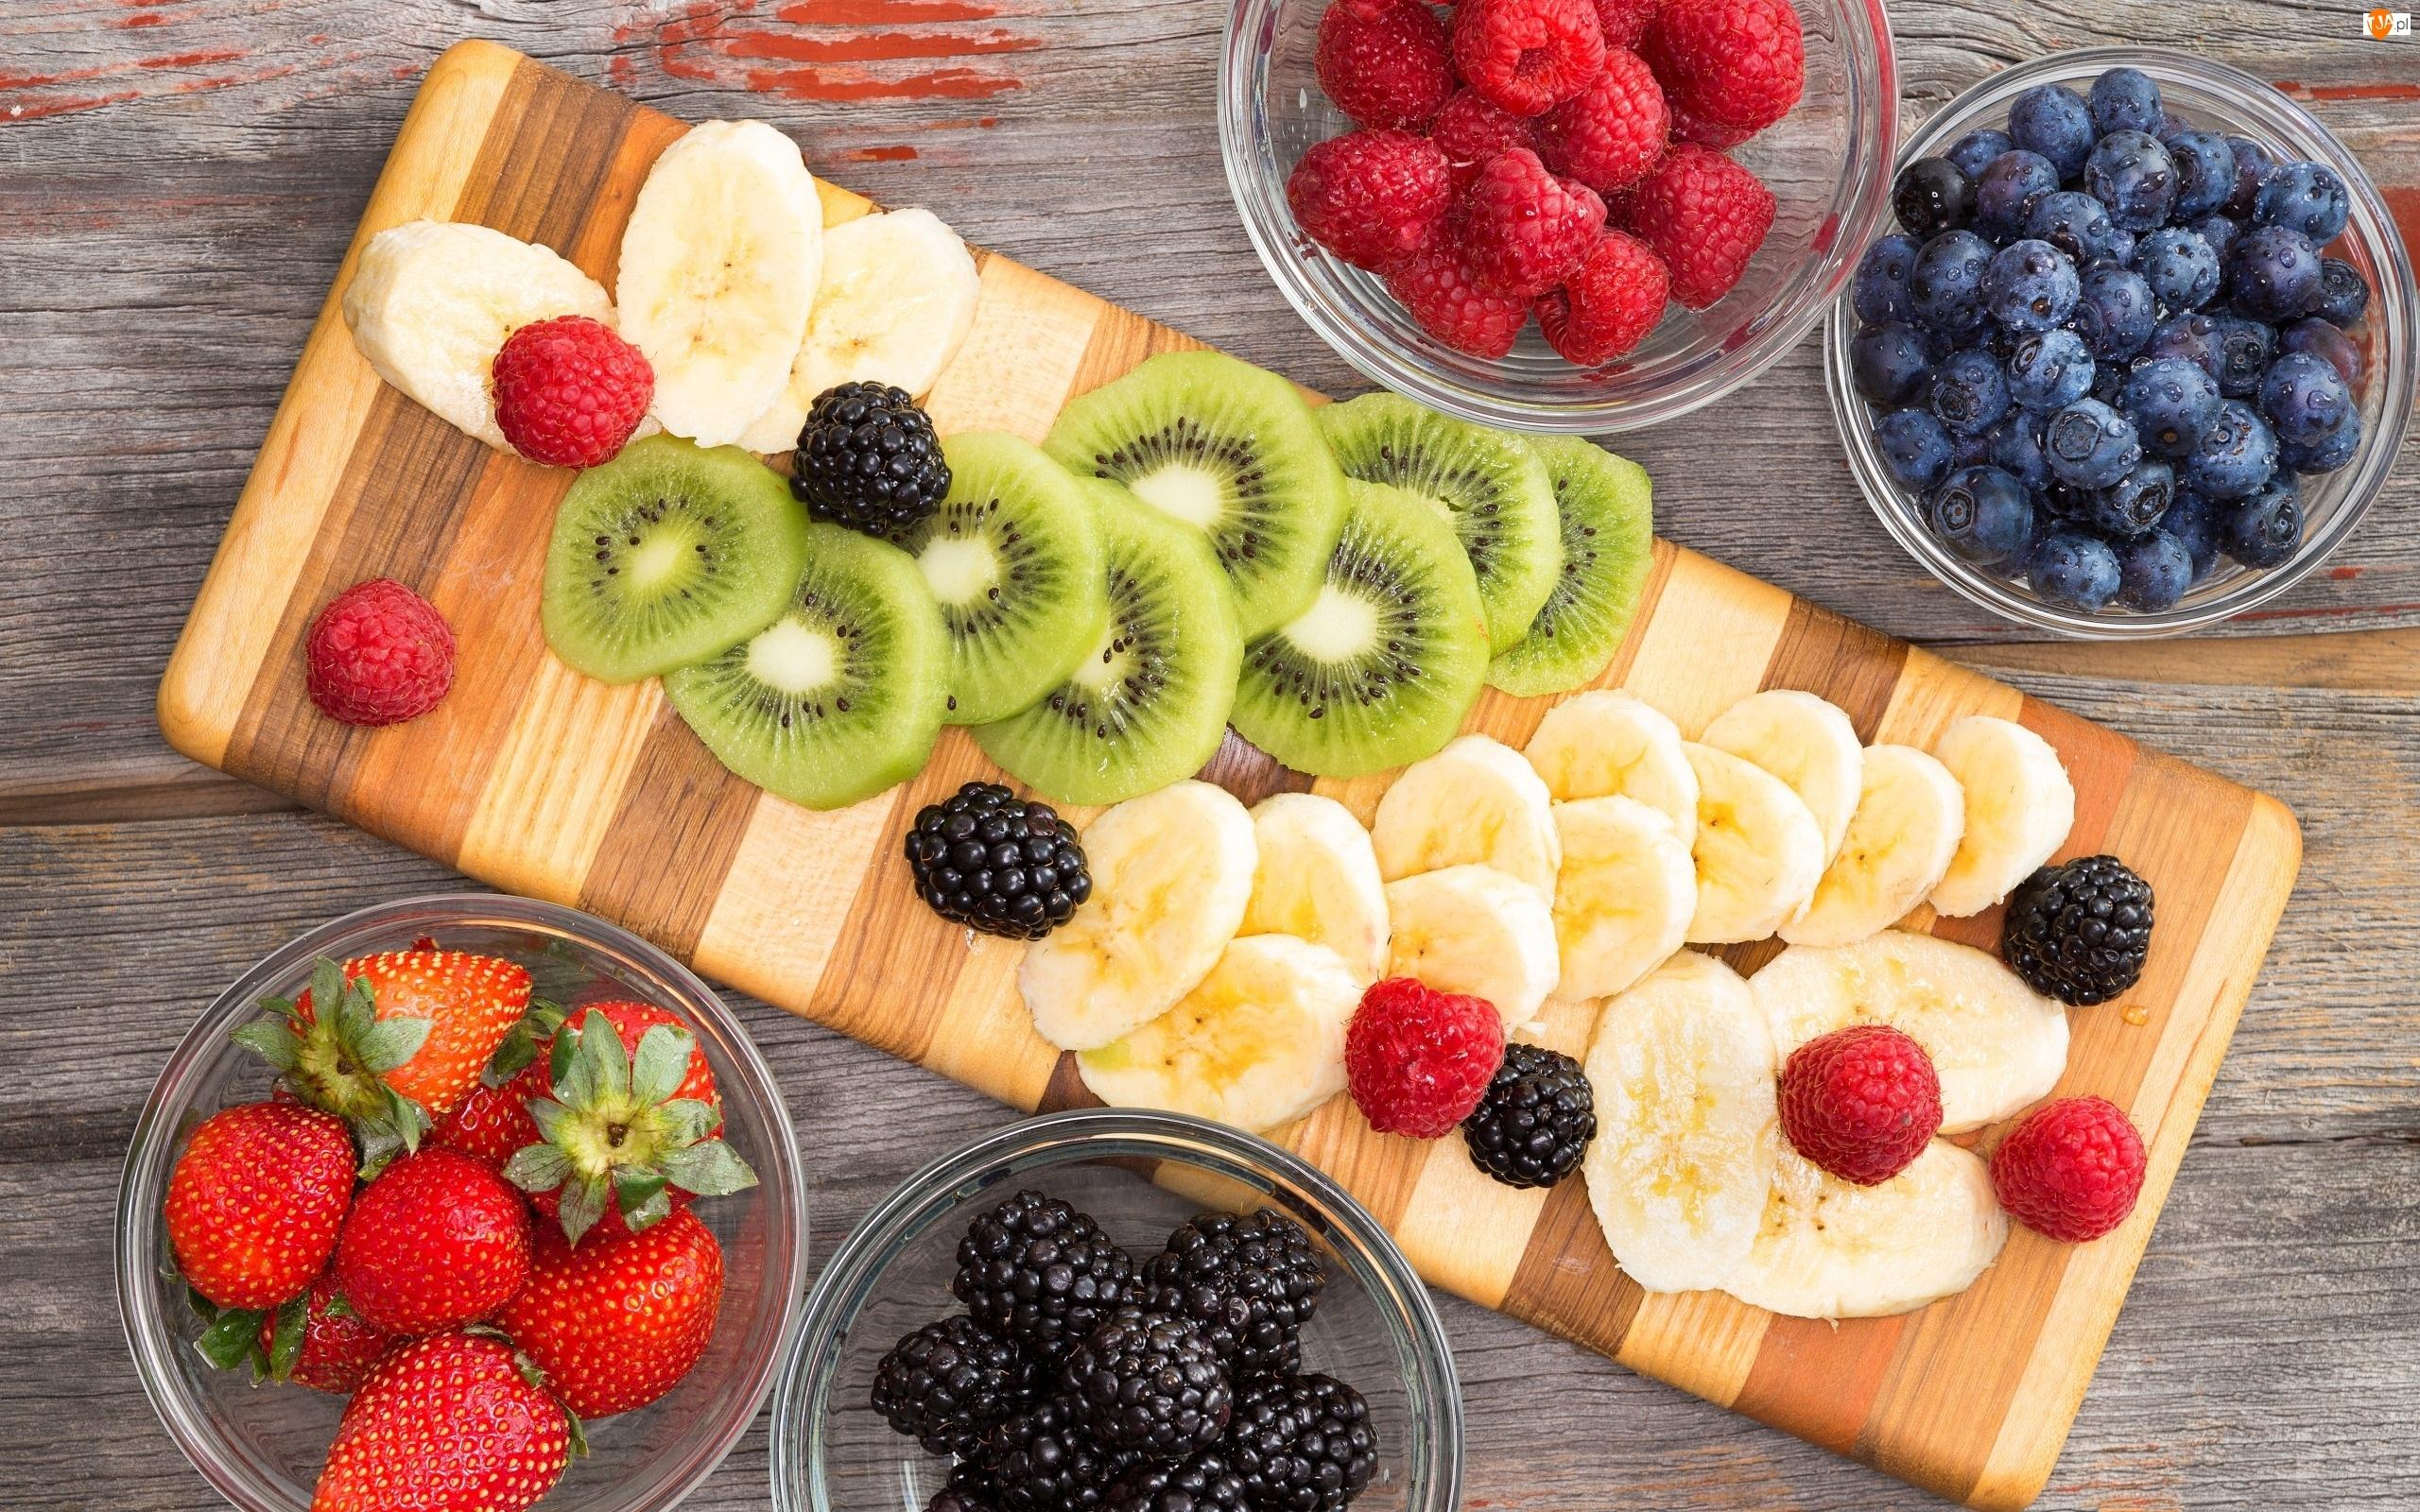 Owoce, Kiwi, Banany, Truskawki, Maliny